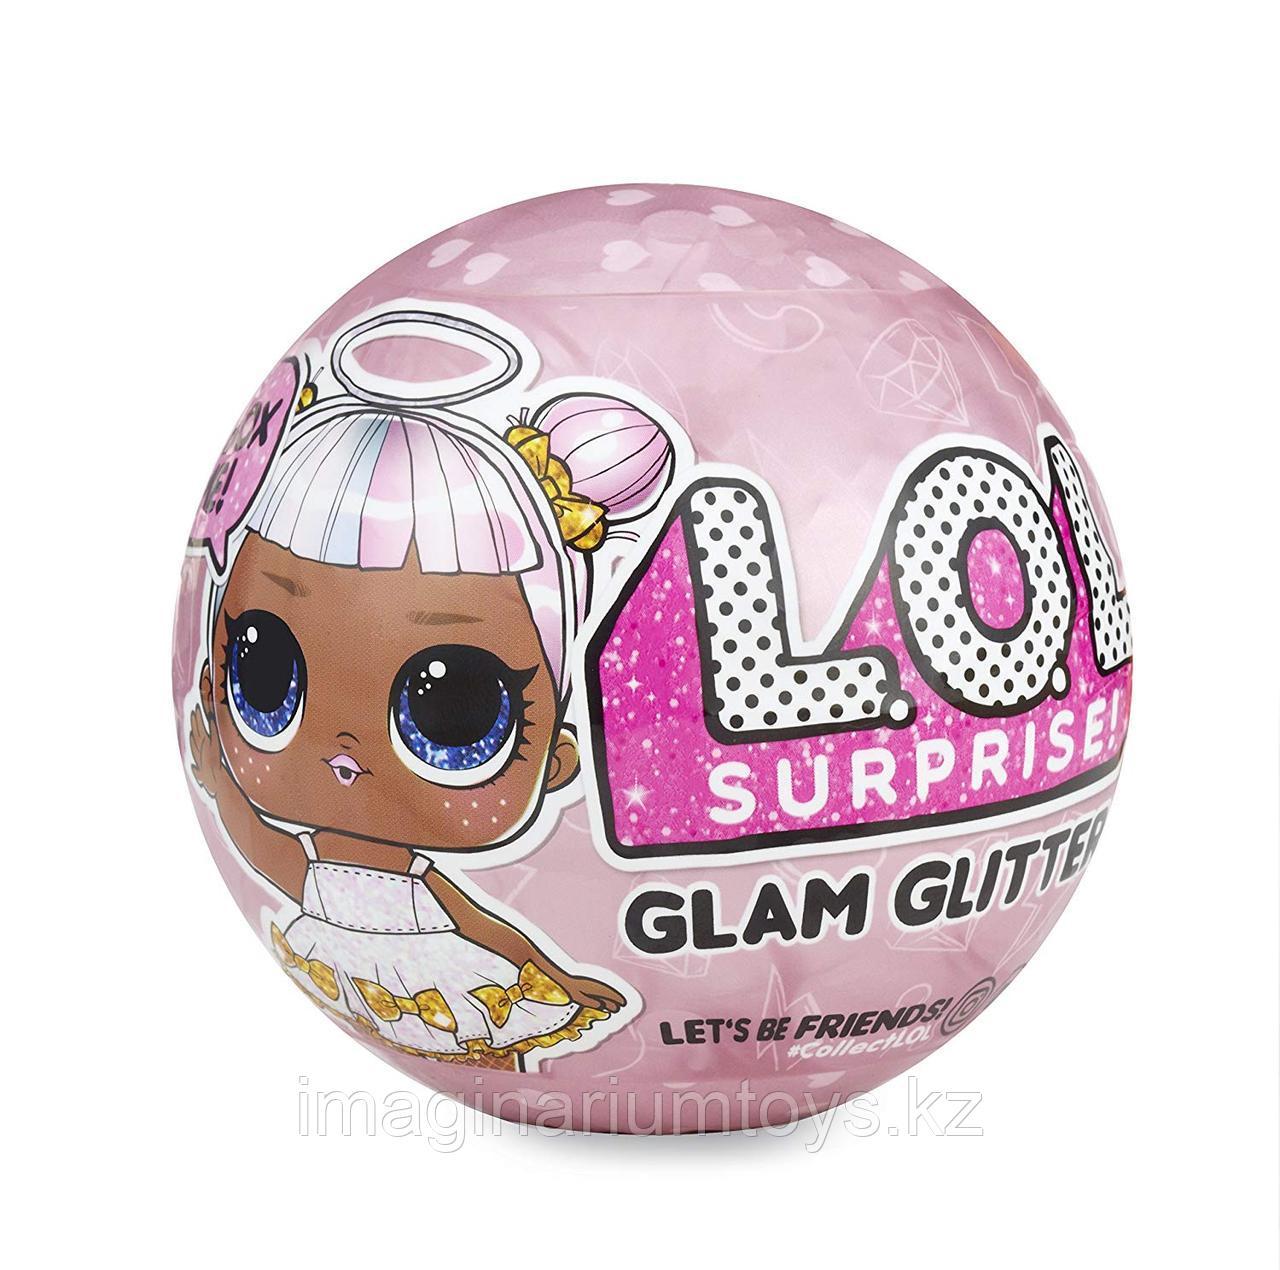 Кукла L.O.L. Surprise Glam Glitter